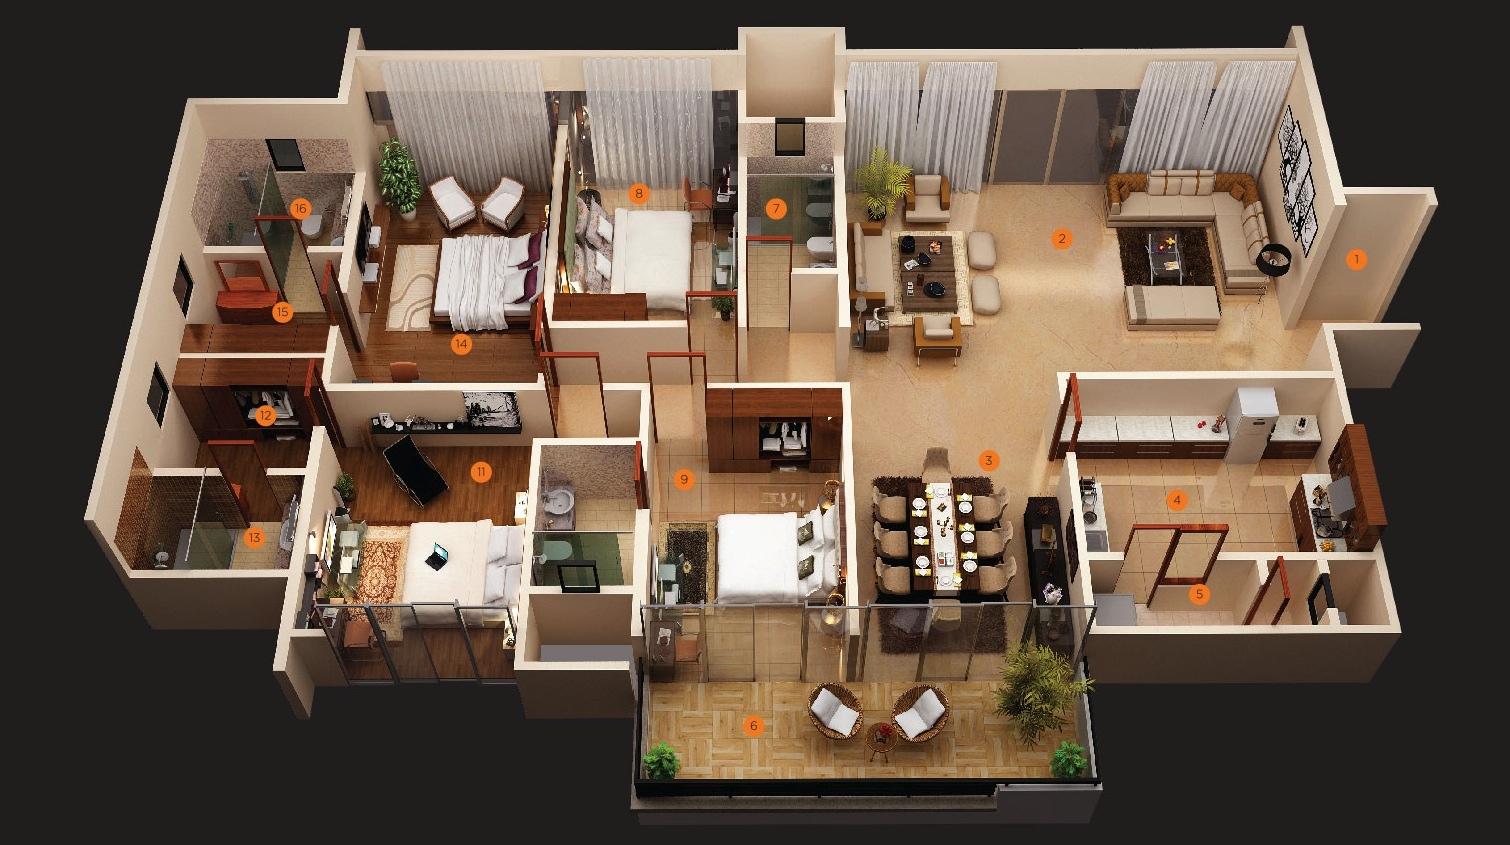 Multi Family Floor Plans In Model Describing Four Bedrooms Large Open E For Living Room